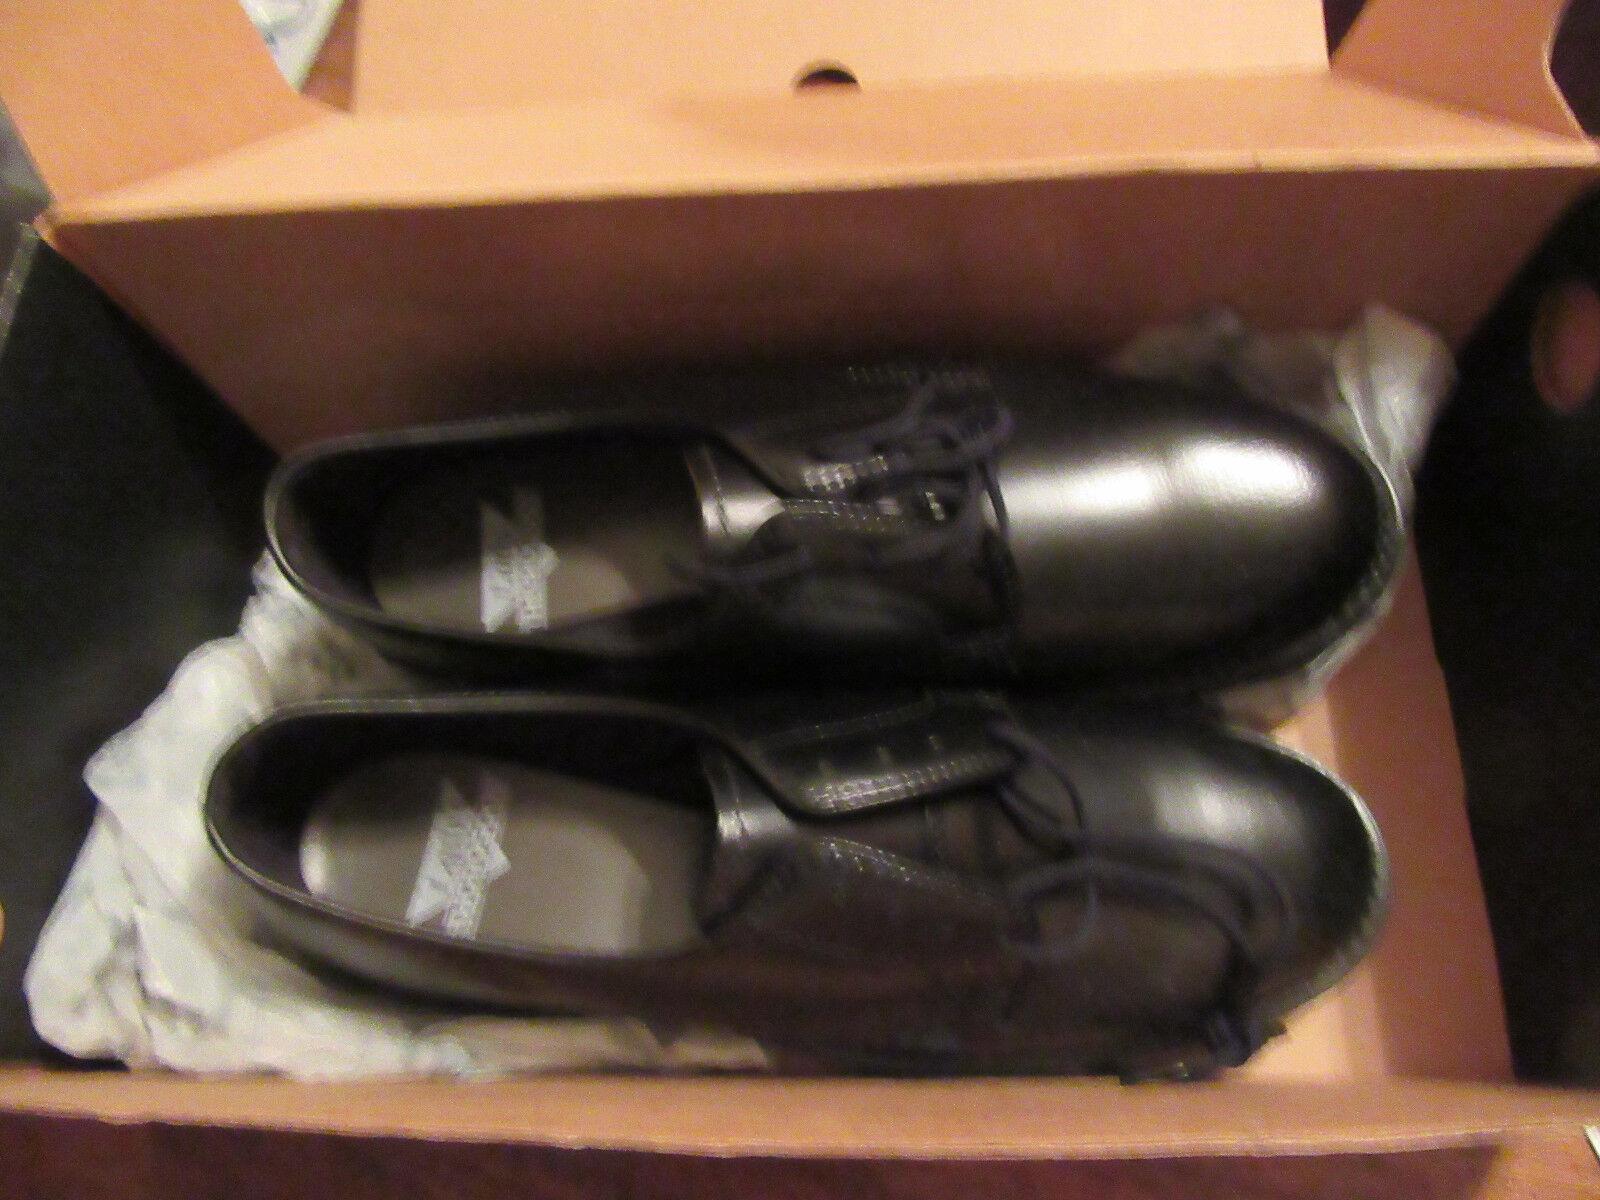 Thgoldgood 534-6047 Women Uniform Classics Leather High Shine Leather Oxford